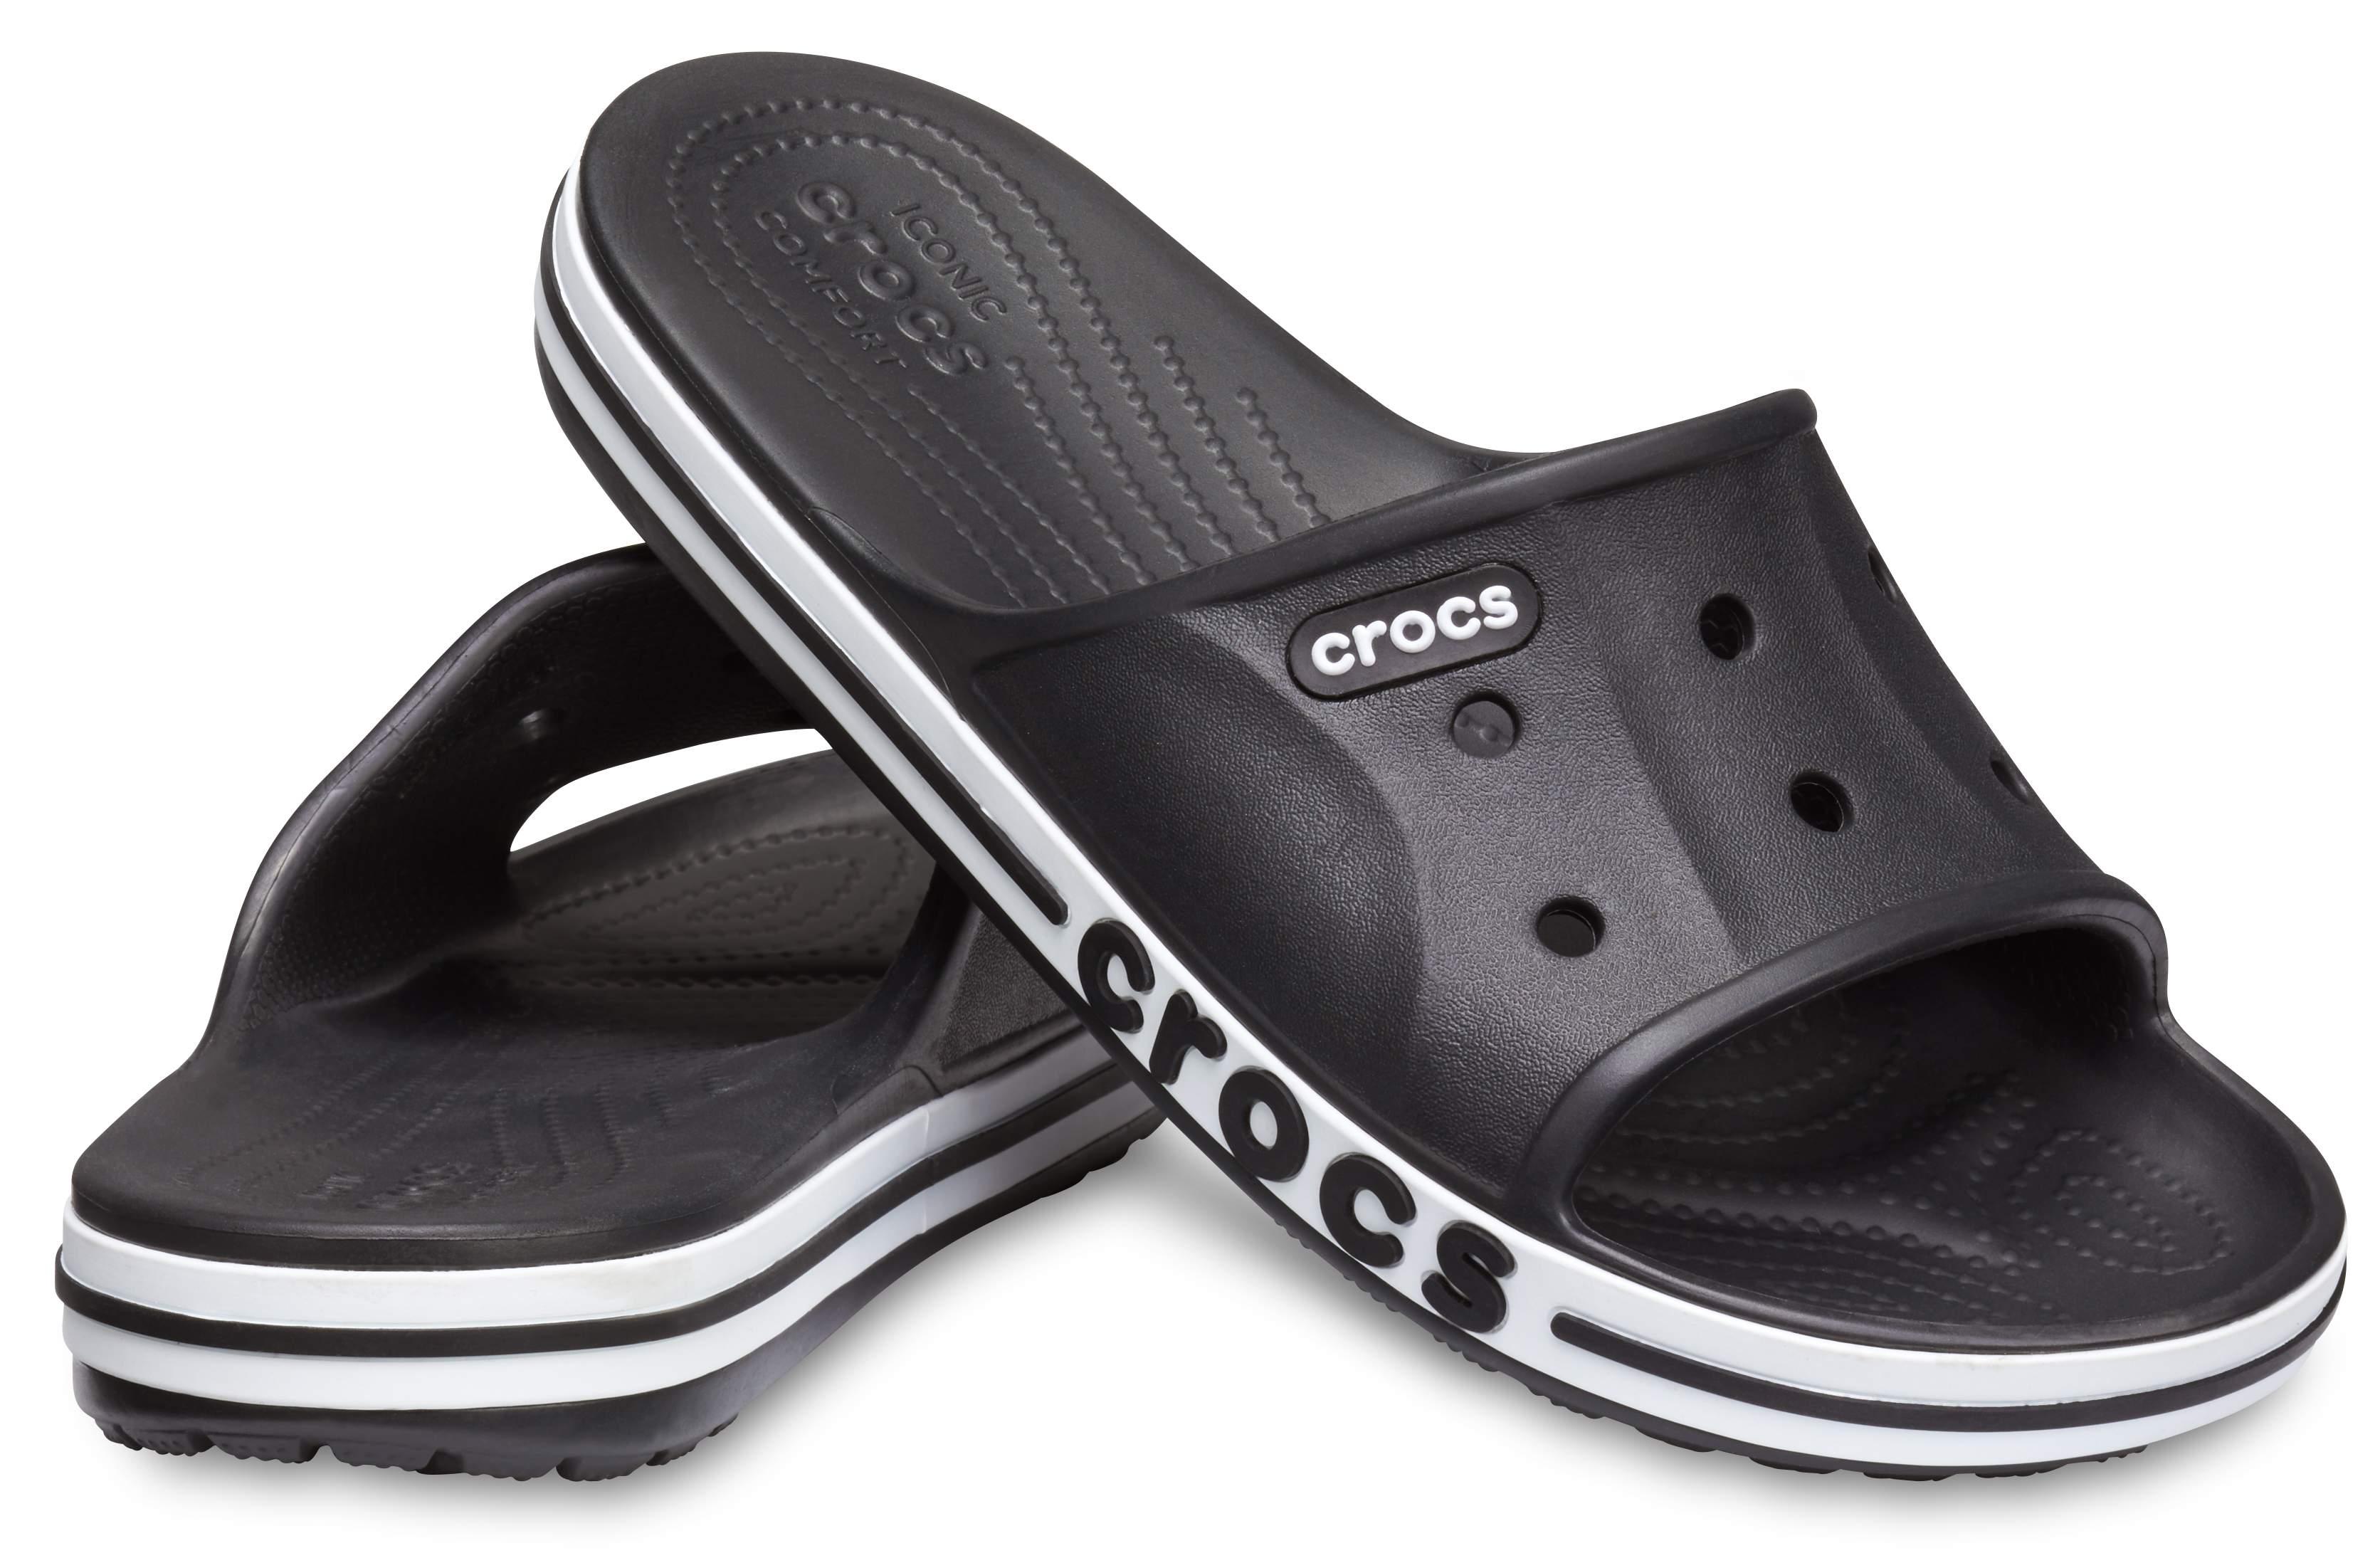 Image of Crocs Bayaband Slide Black 205392-066